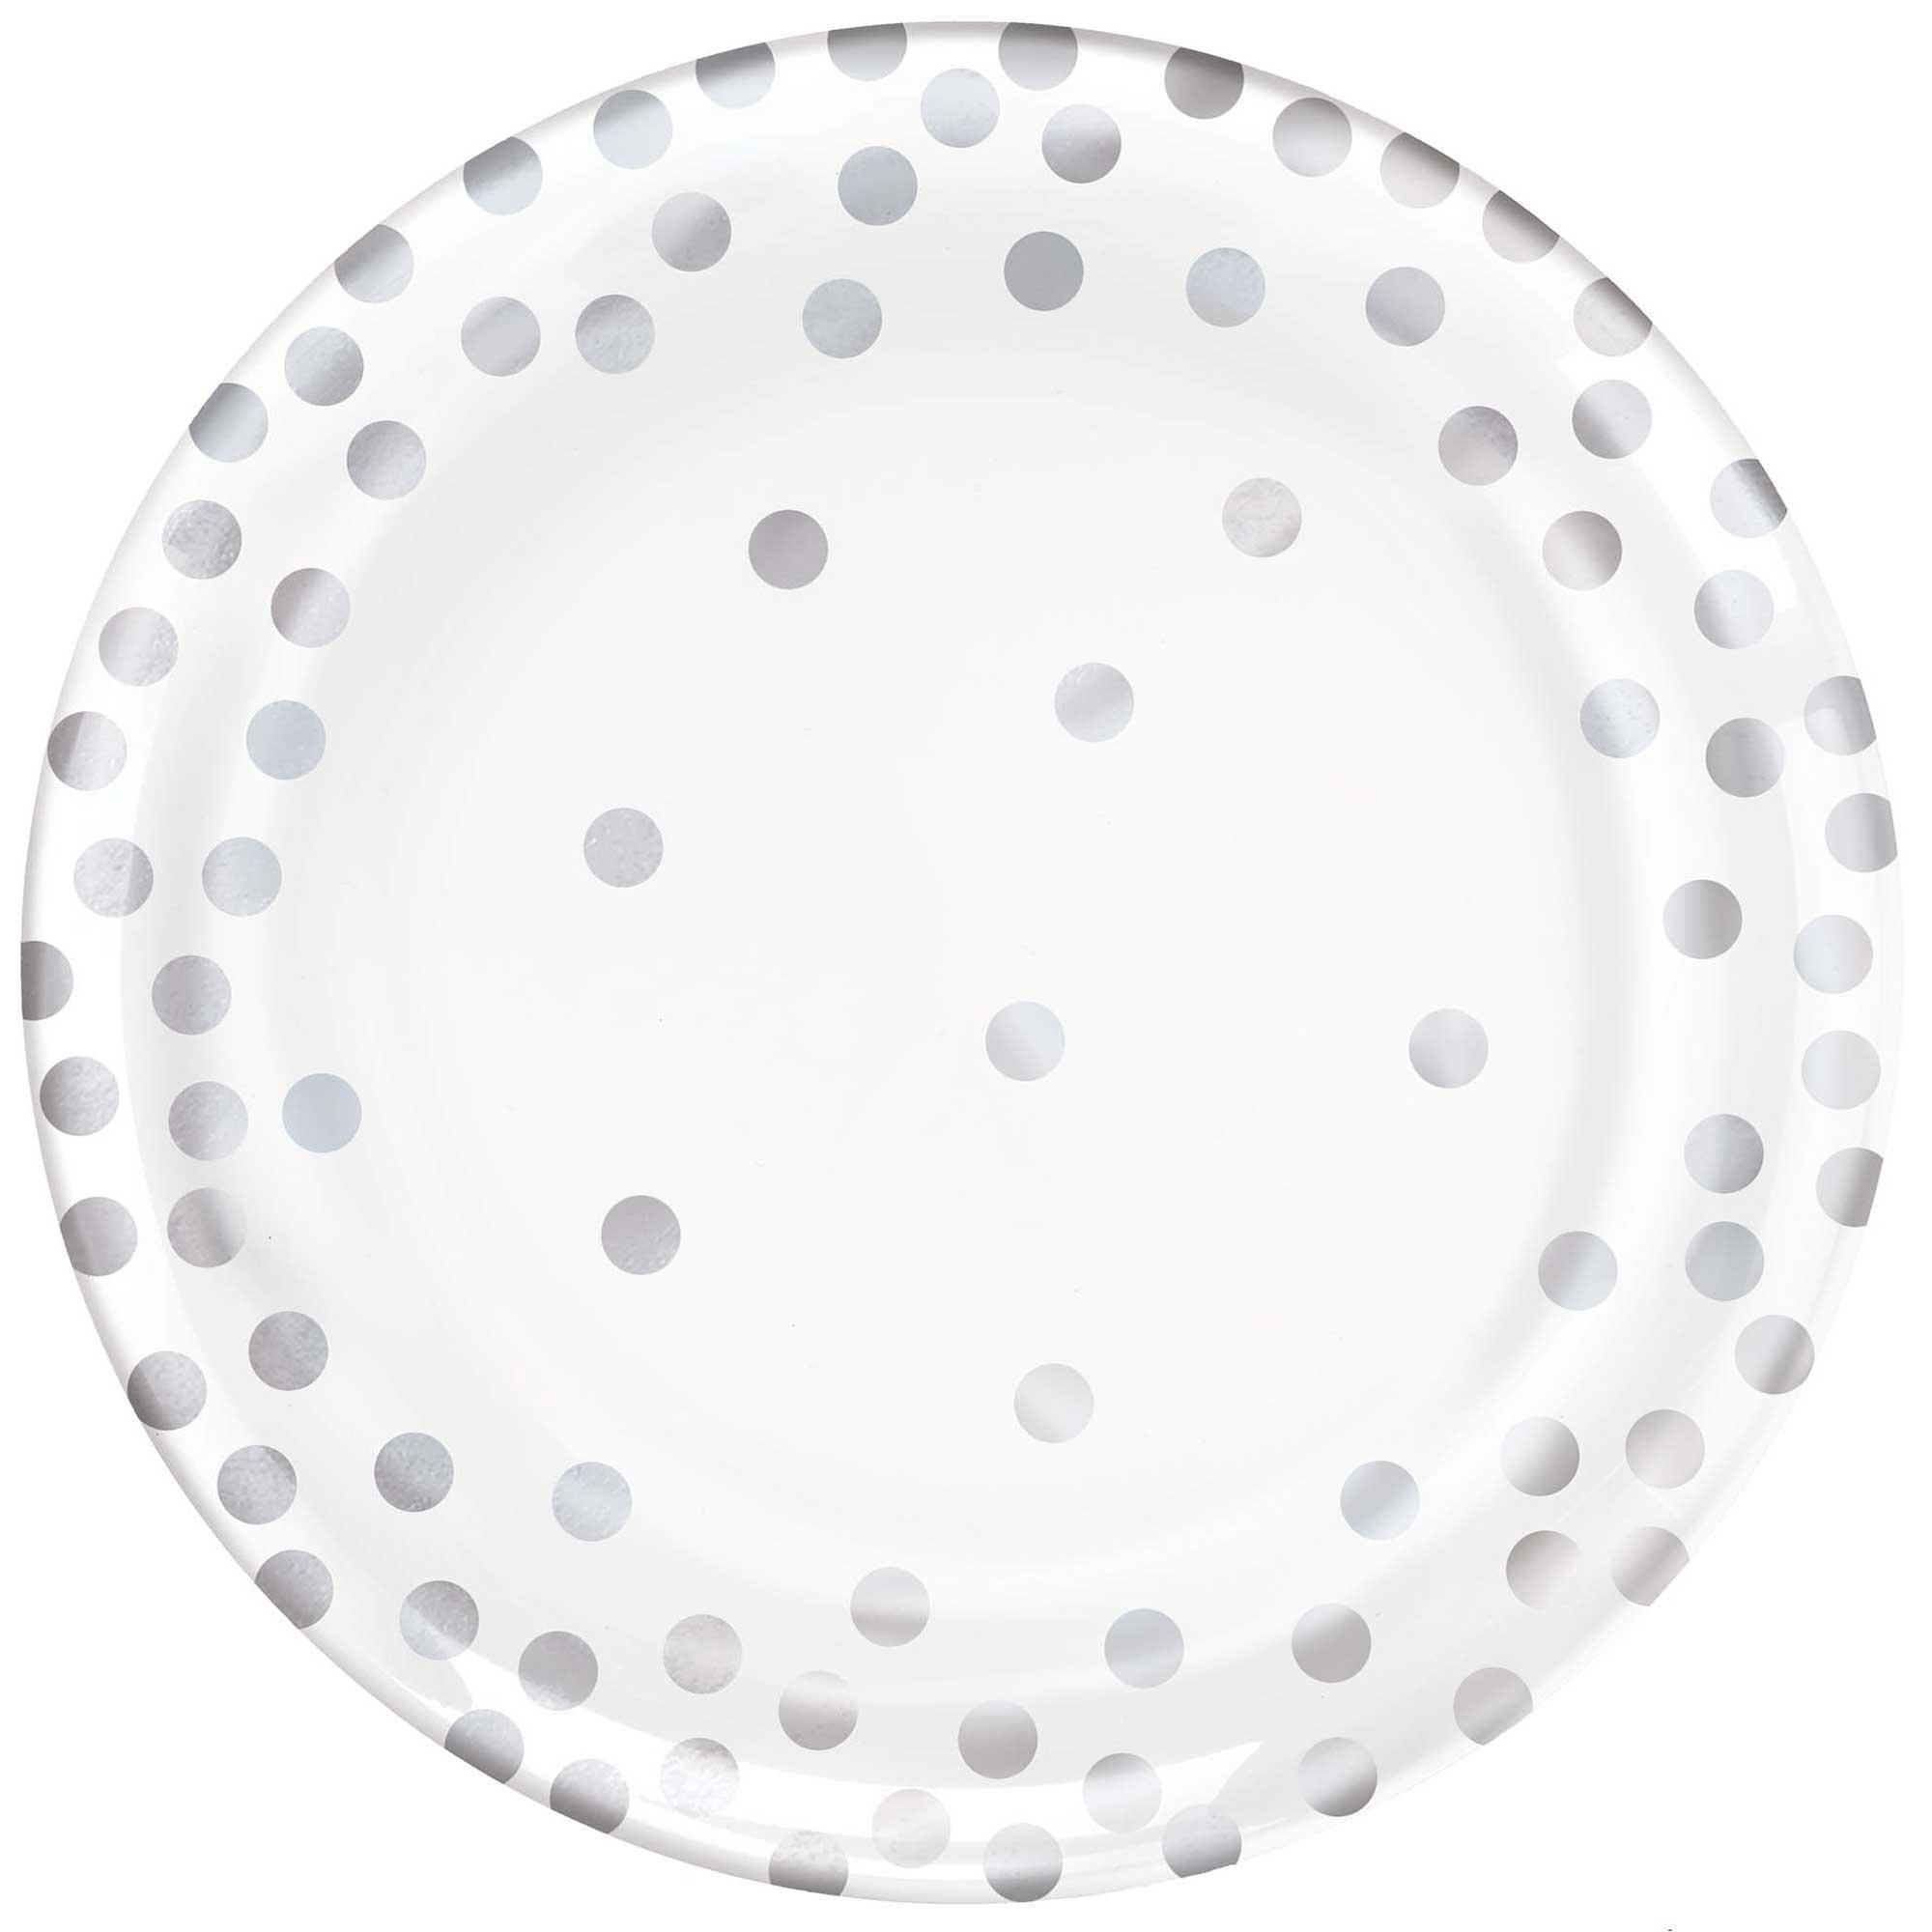 """Confetti Silver Dots 6""""/ 15cm Round Plates Hot Stamped Plastic"